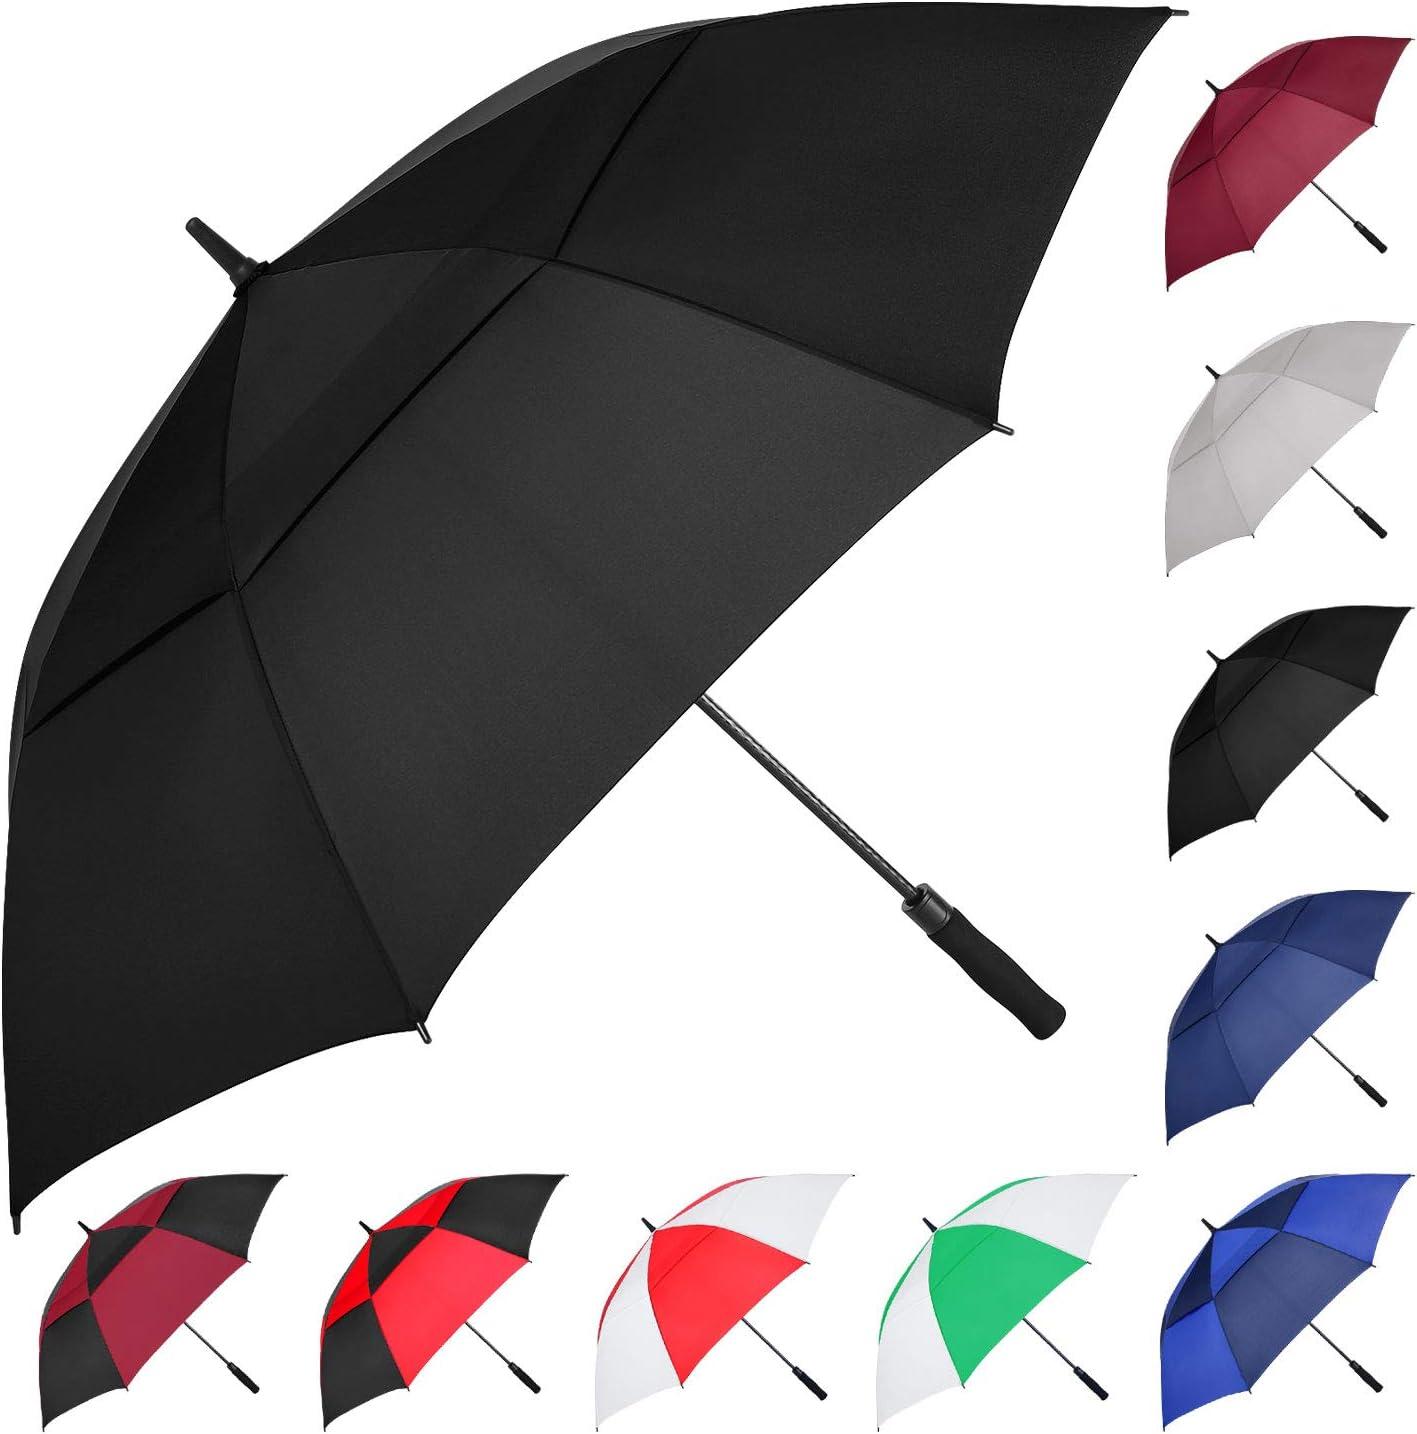 MRTLLOA Automatic Open Golf Portland Mall Umbrella Ove 62 Inch Sale special price Extra-Large 68